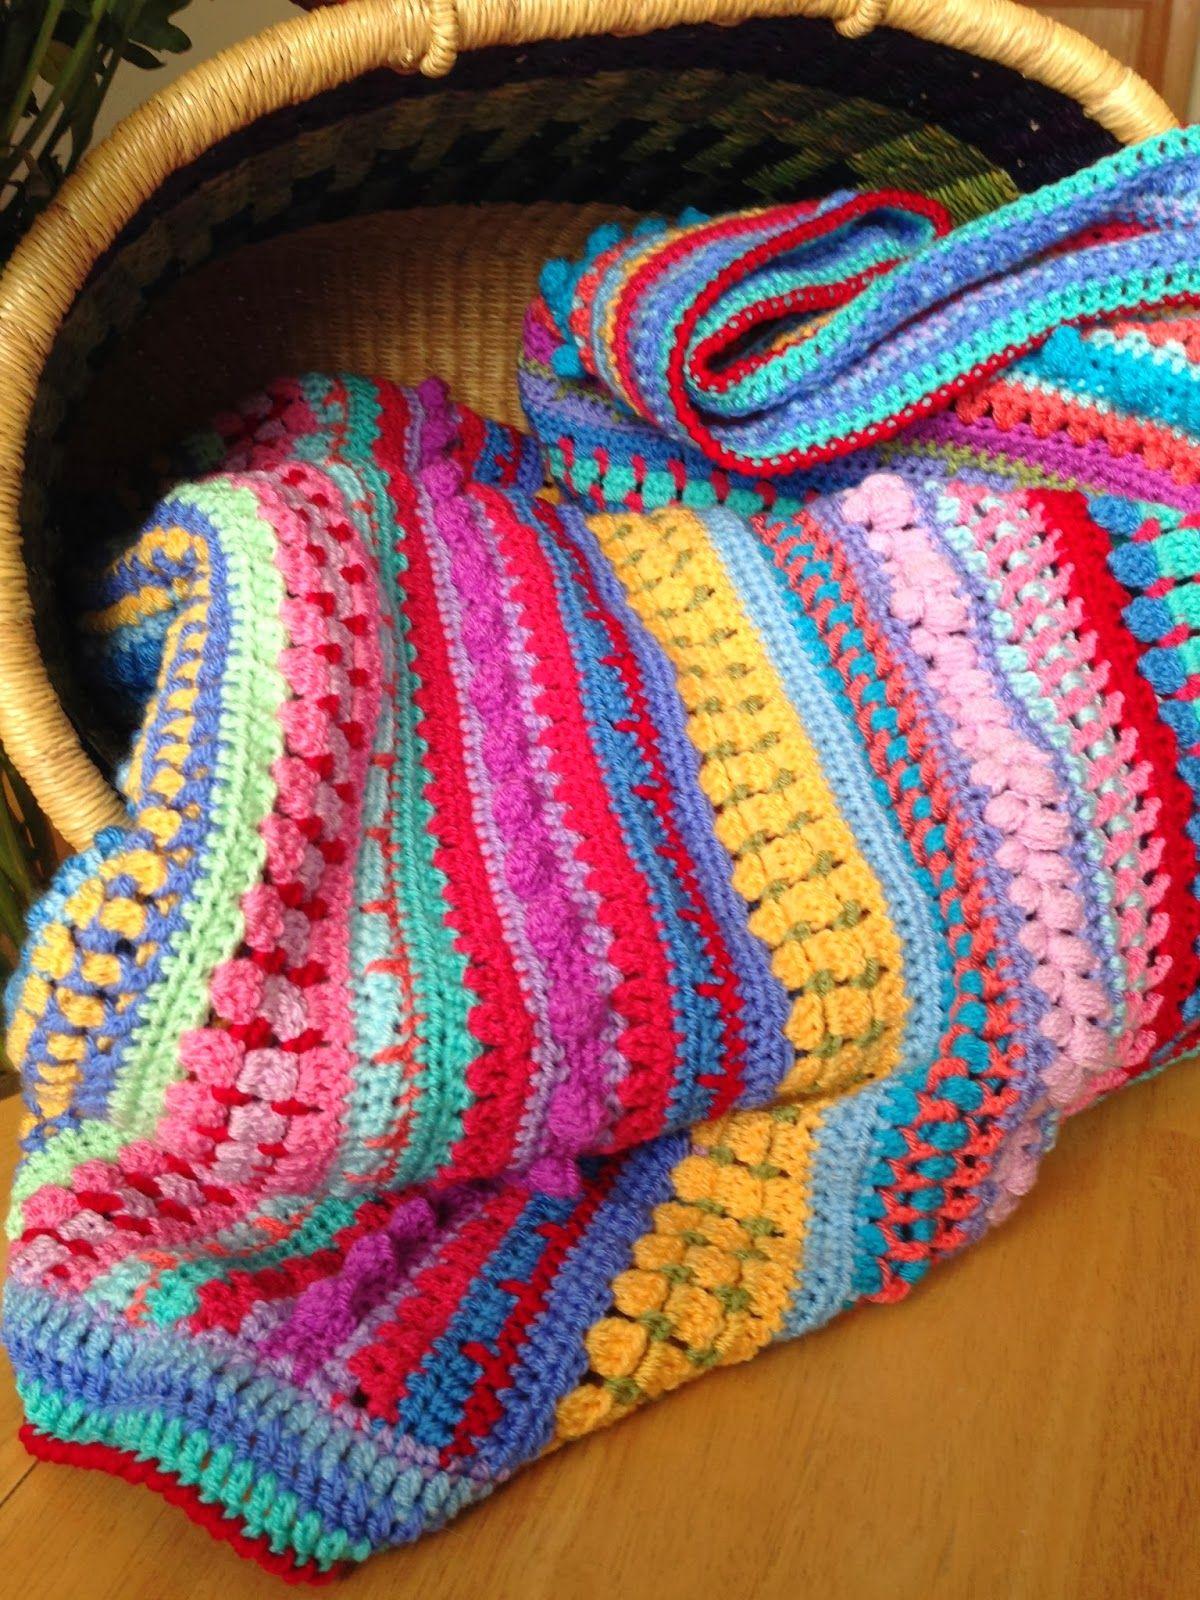 Crochet blanket free pattern teresa restegui httpwww crochet blanket free pattern teresa restegui httppinterest bankloansurffo Image collections